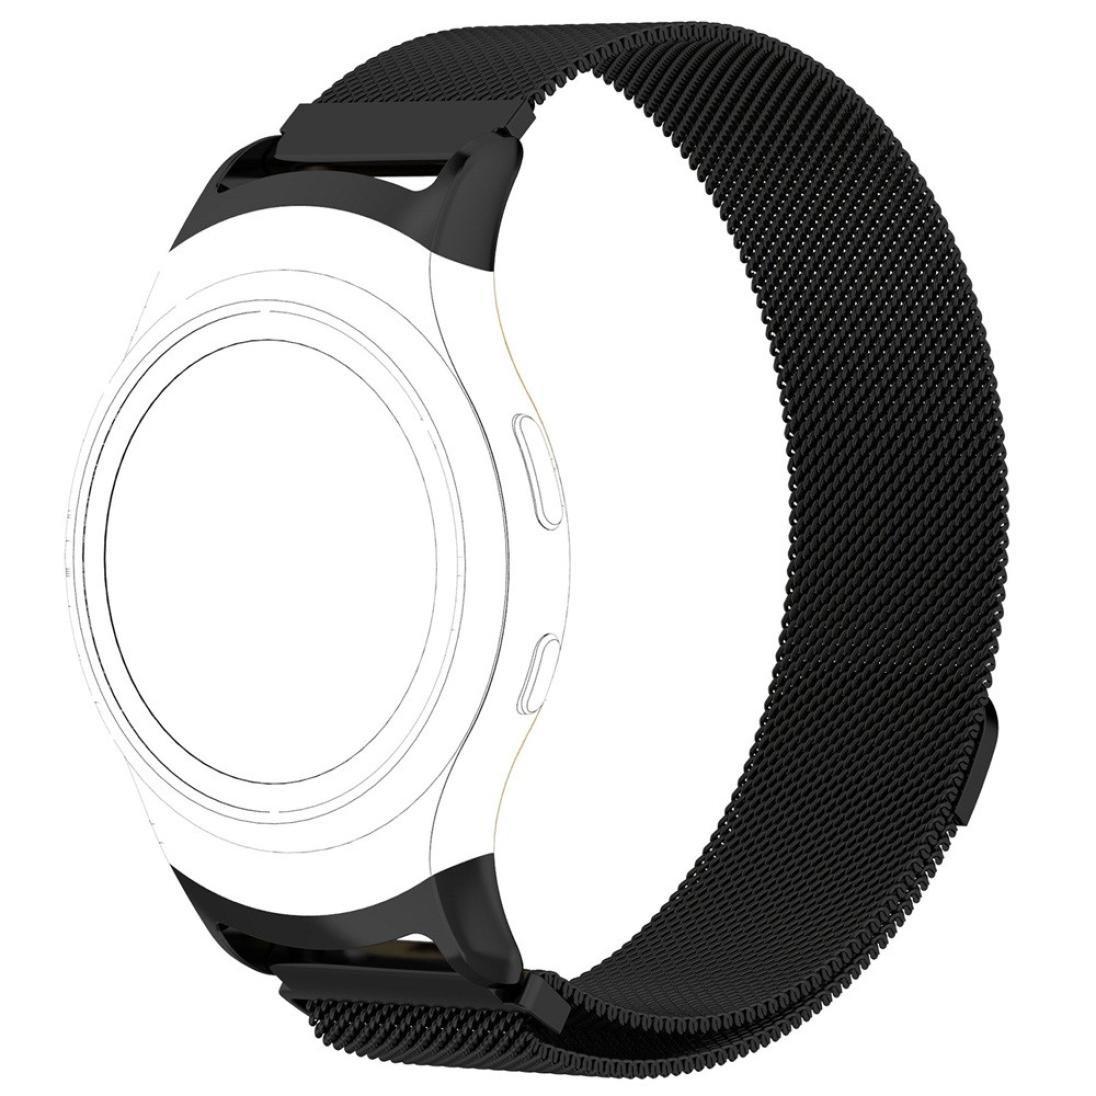 Voberry Magnetic Mesh Loop Milanese Stainless Steel Bracelet Strap For Samsung Gear S2 SM-R720/SM-R730 (Black)